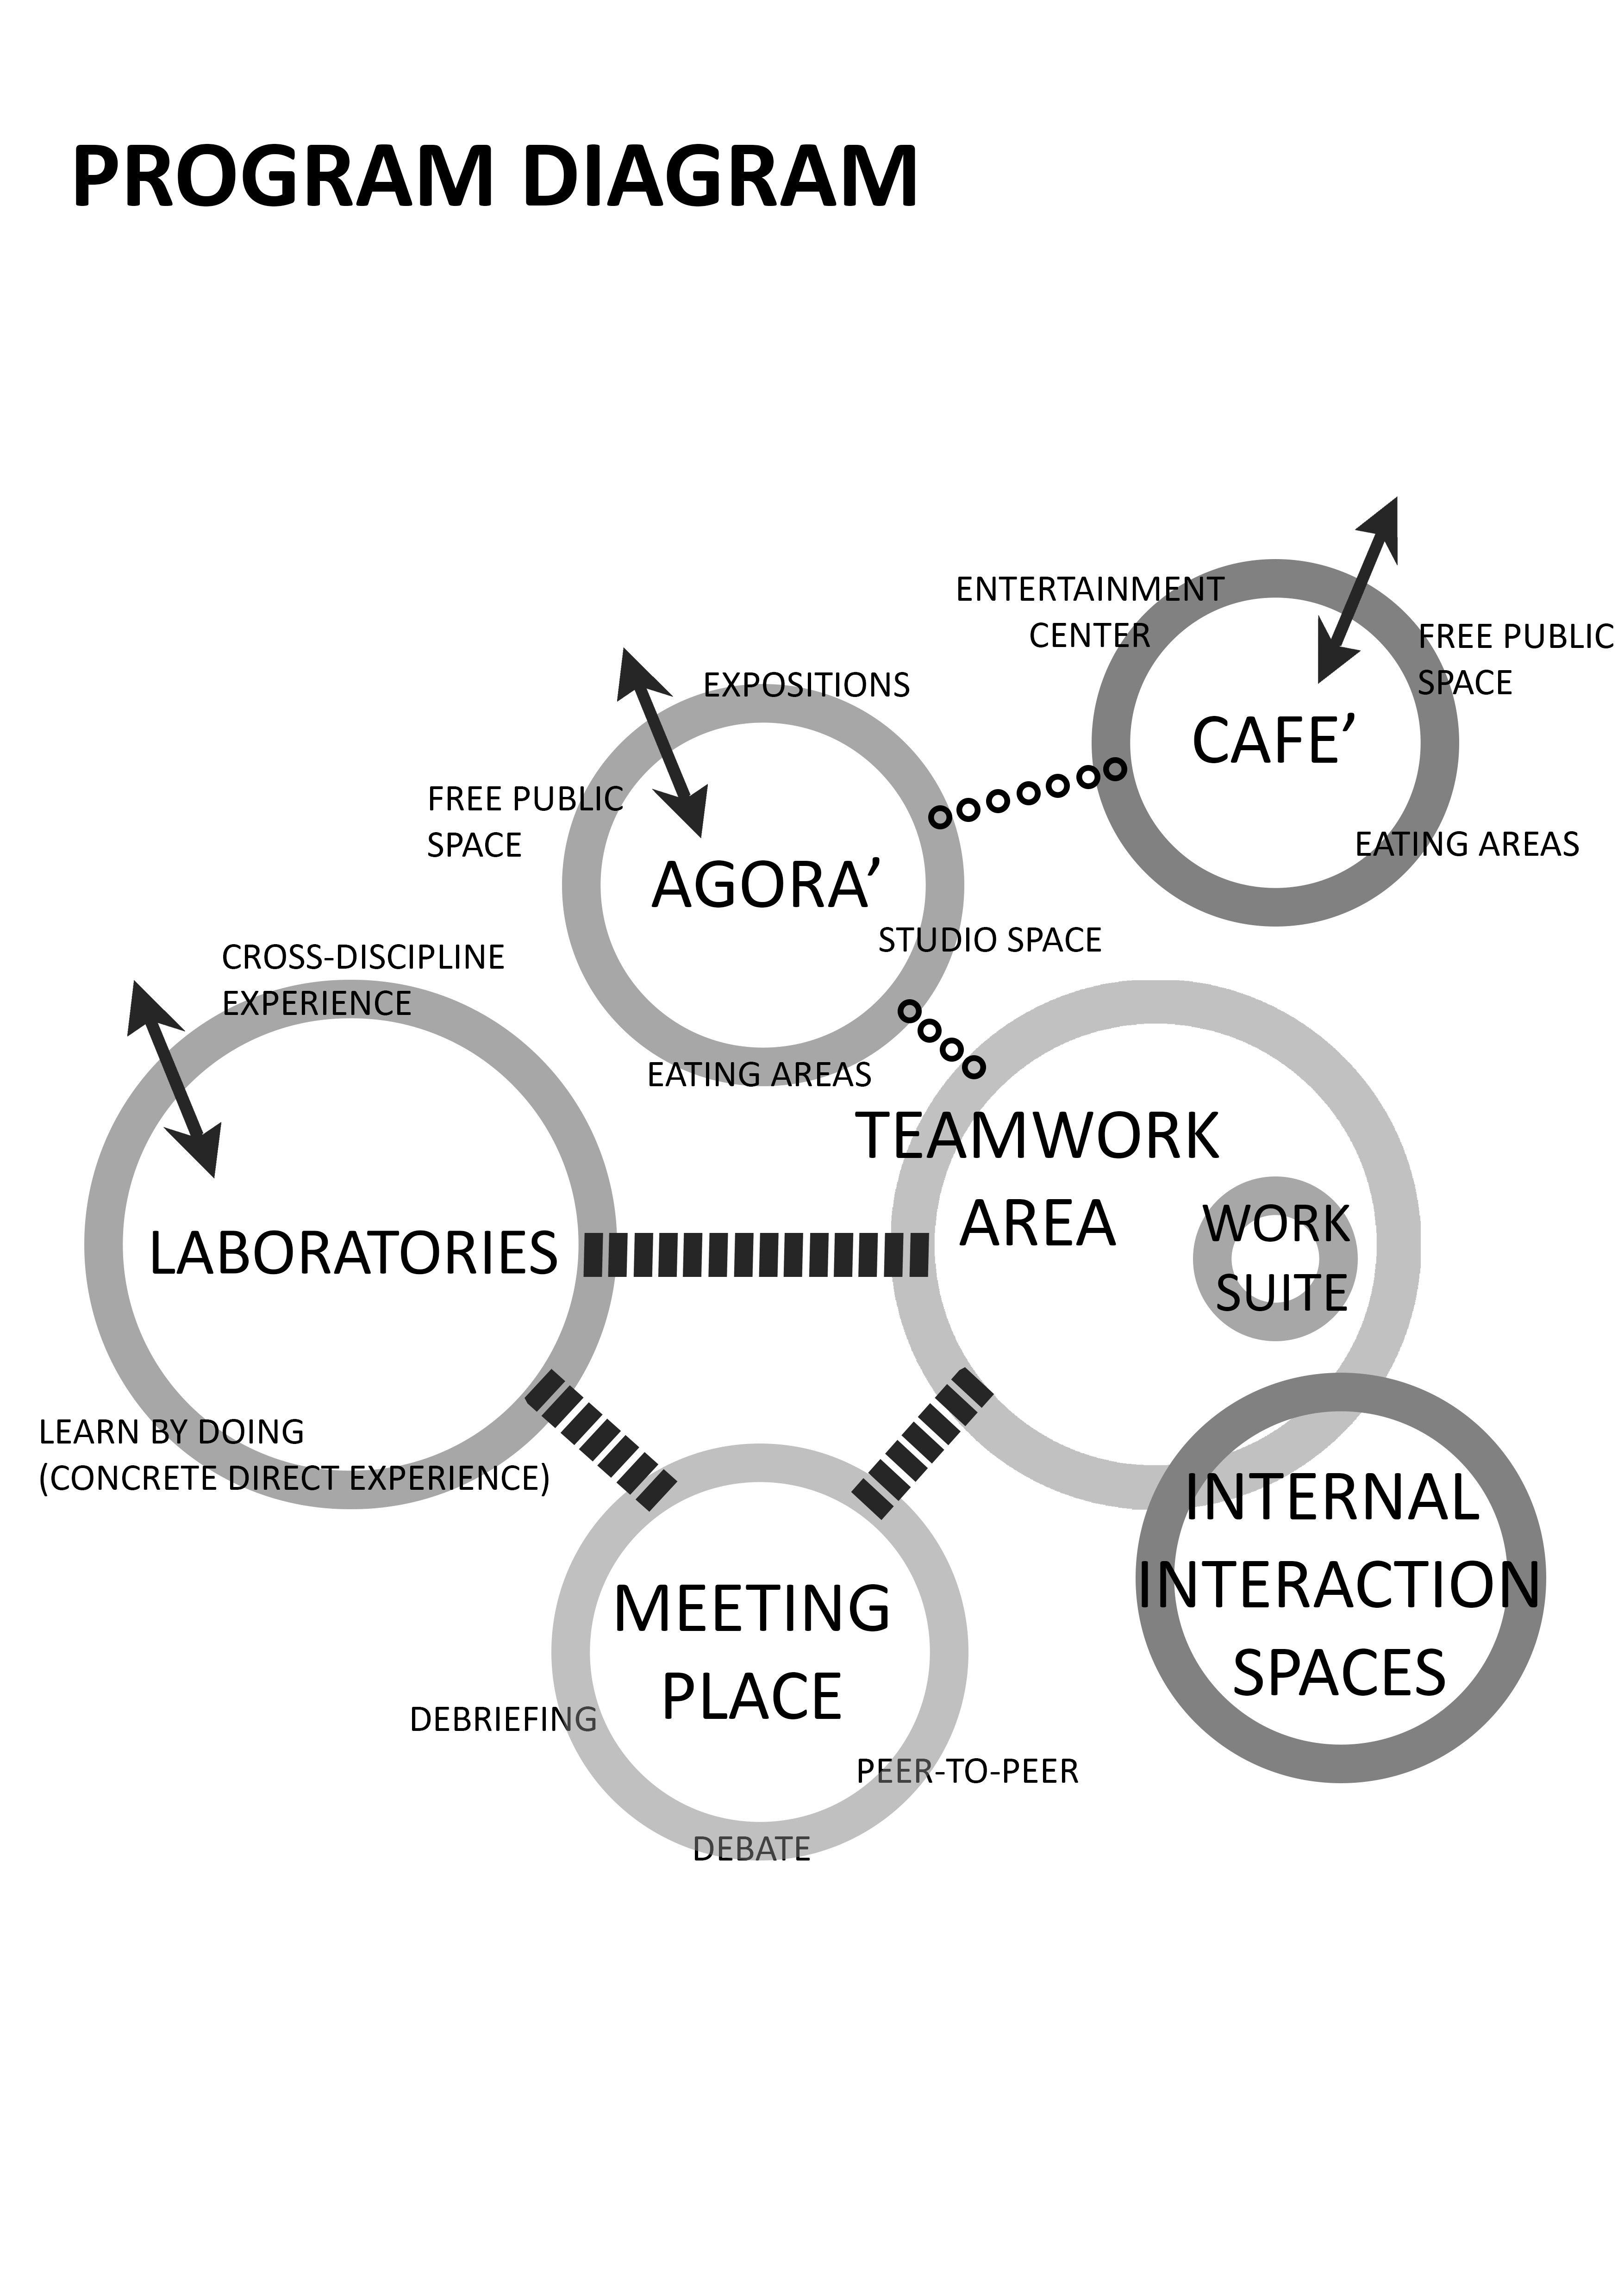 Museum Bubble Diagram Landscape 6 Pin Cdi Wiring Diagrama De Programa Analisis Preliminar Conceptual